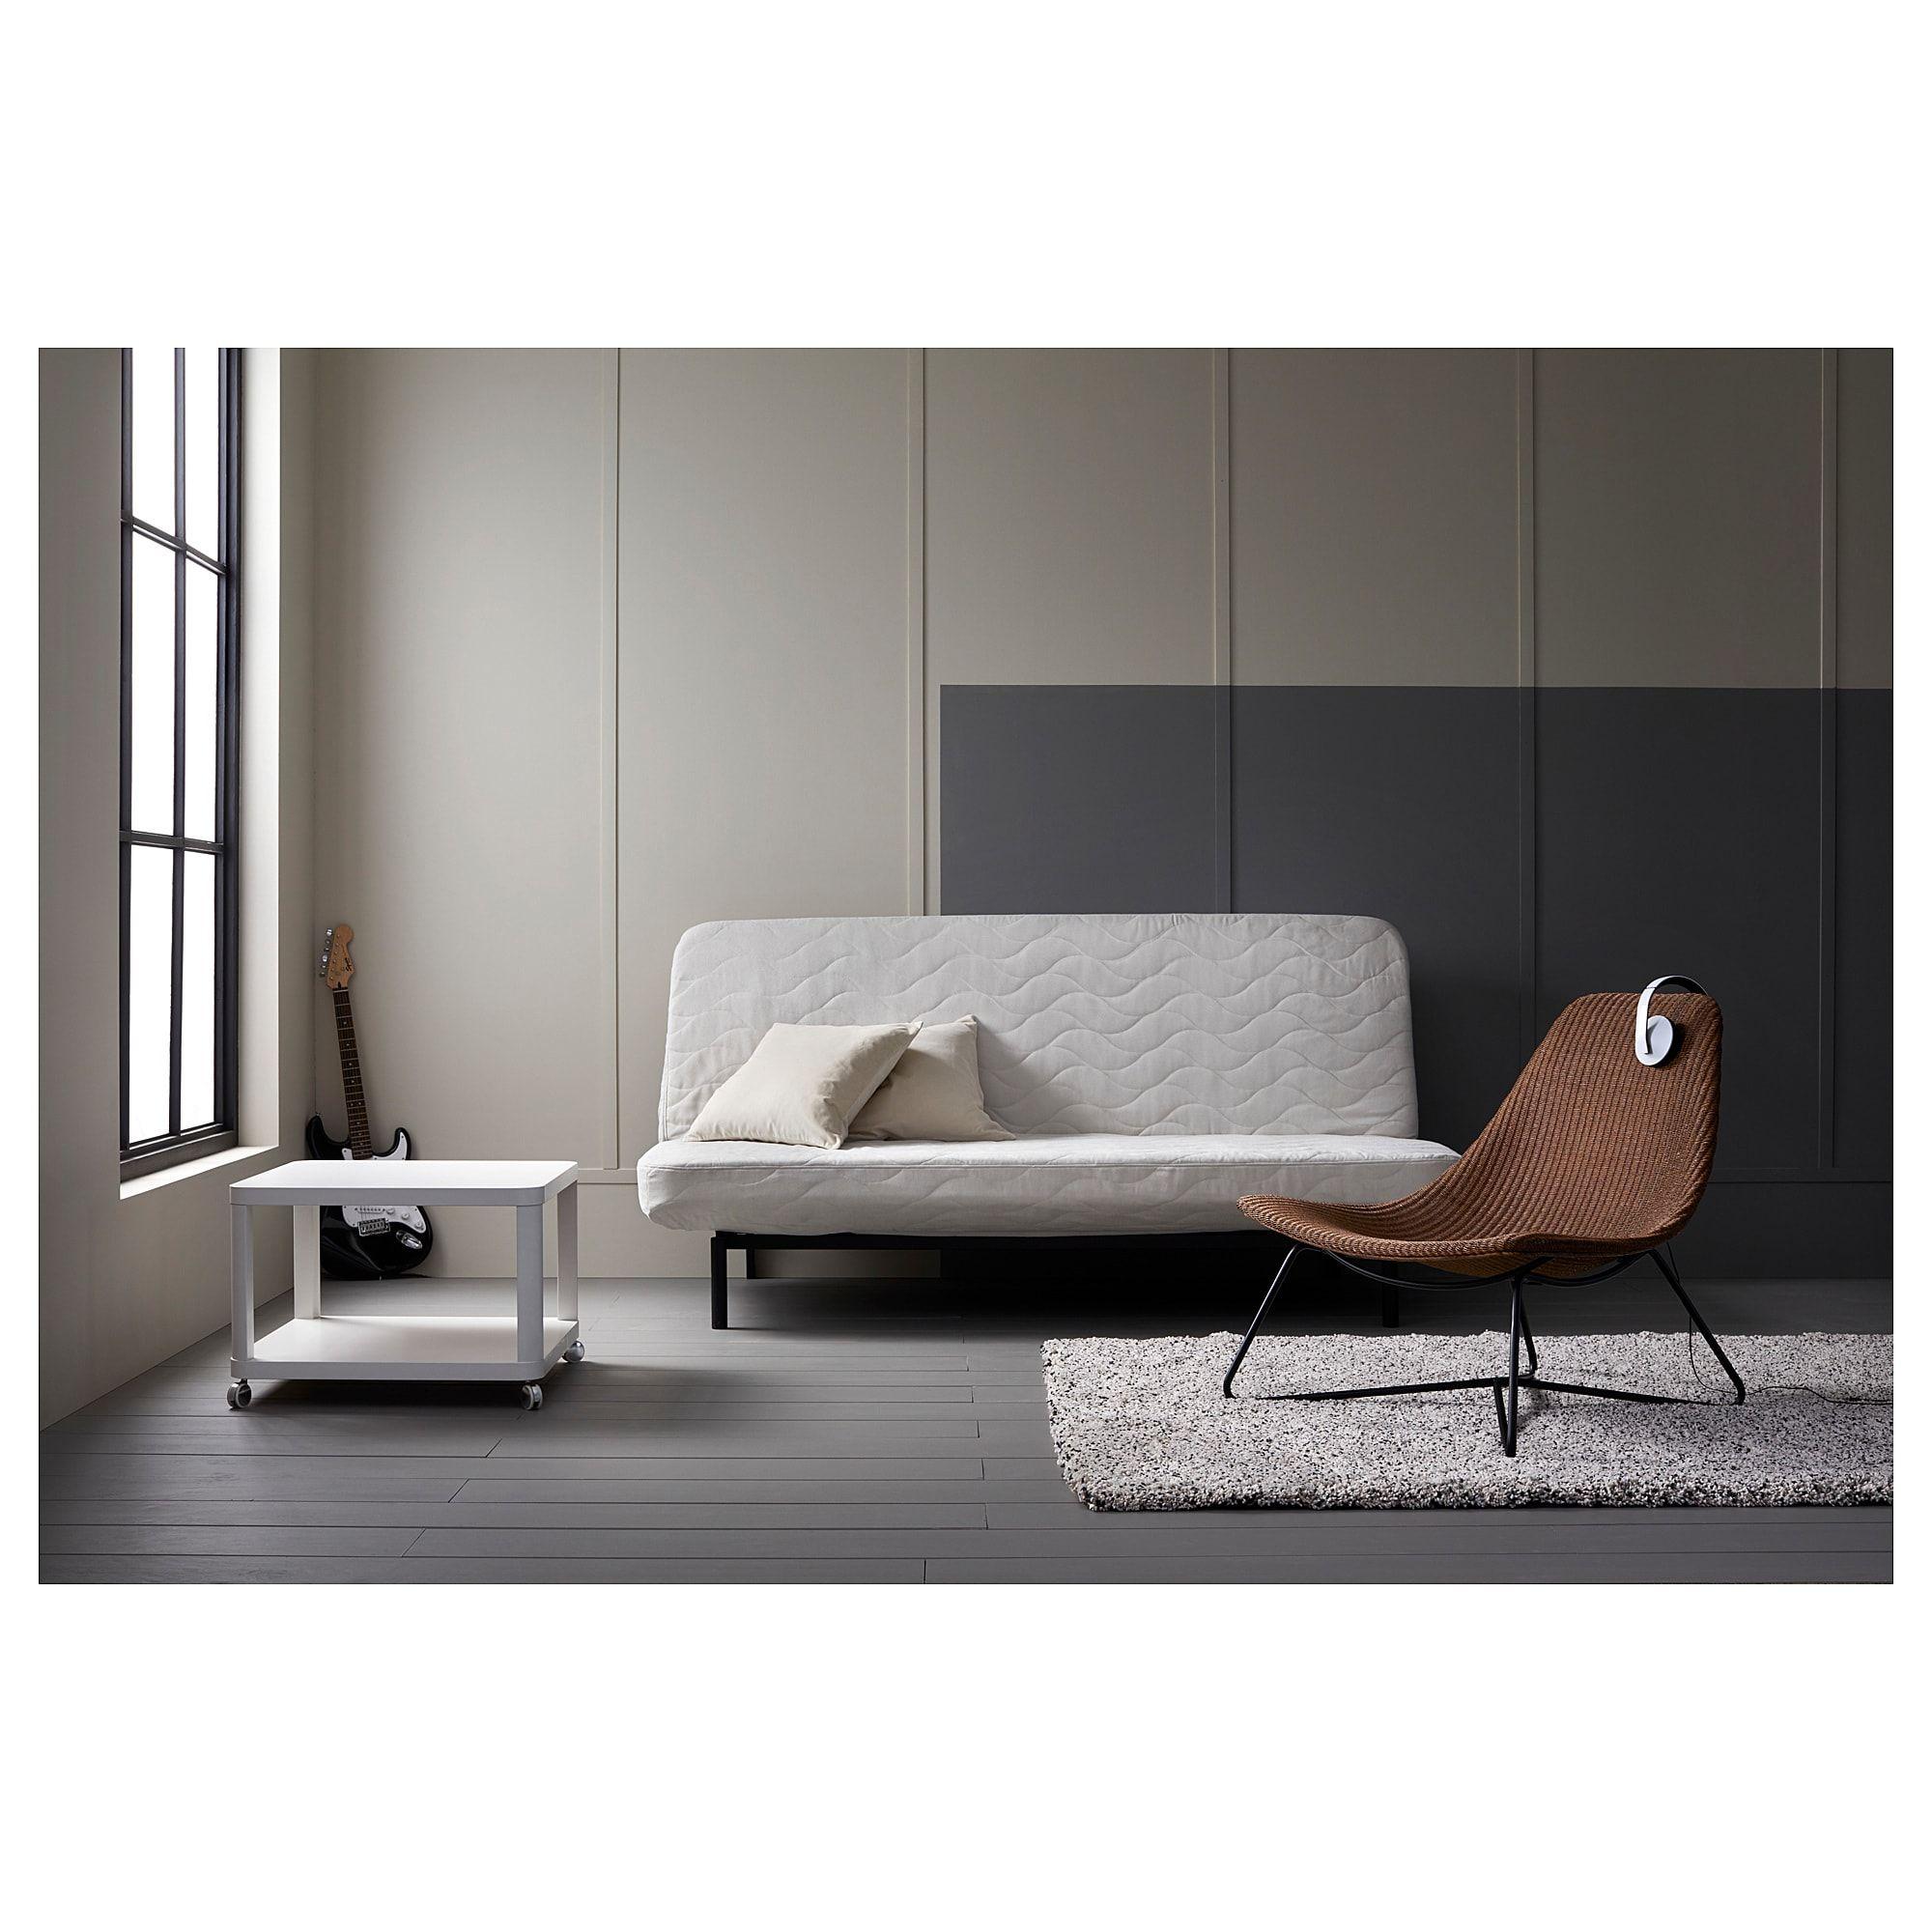 Furniture And Home Furnishings Home Hacks Ikea Sofa Bed Frame